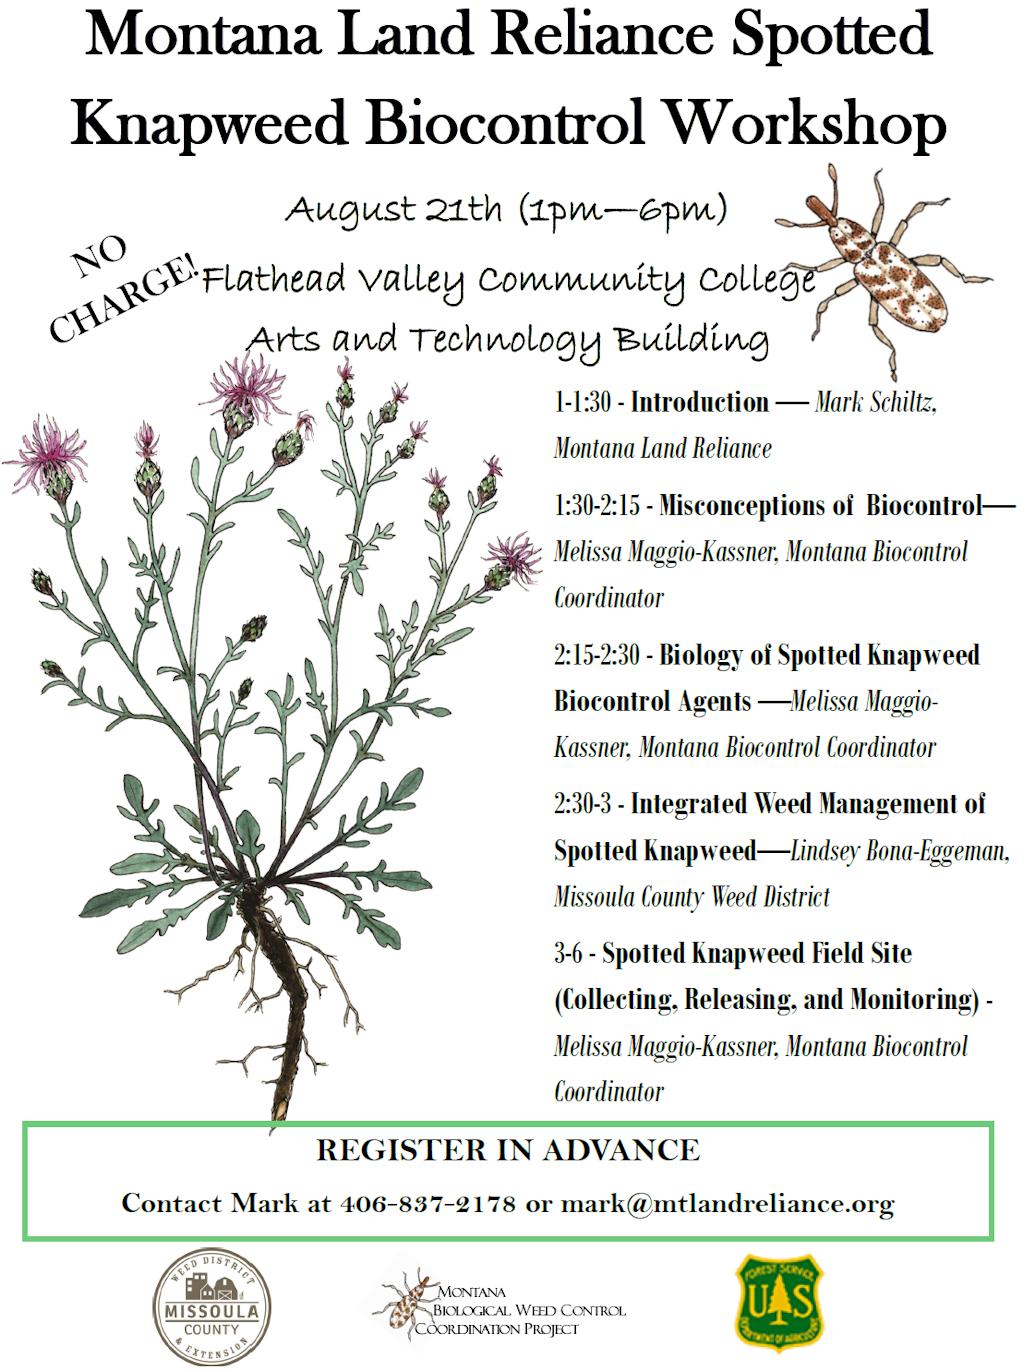 MLR Spotted Knapweed Biocontrol Workshop Aug 21 2015